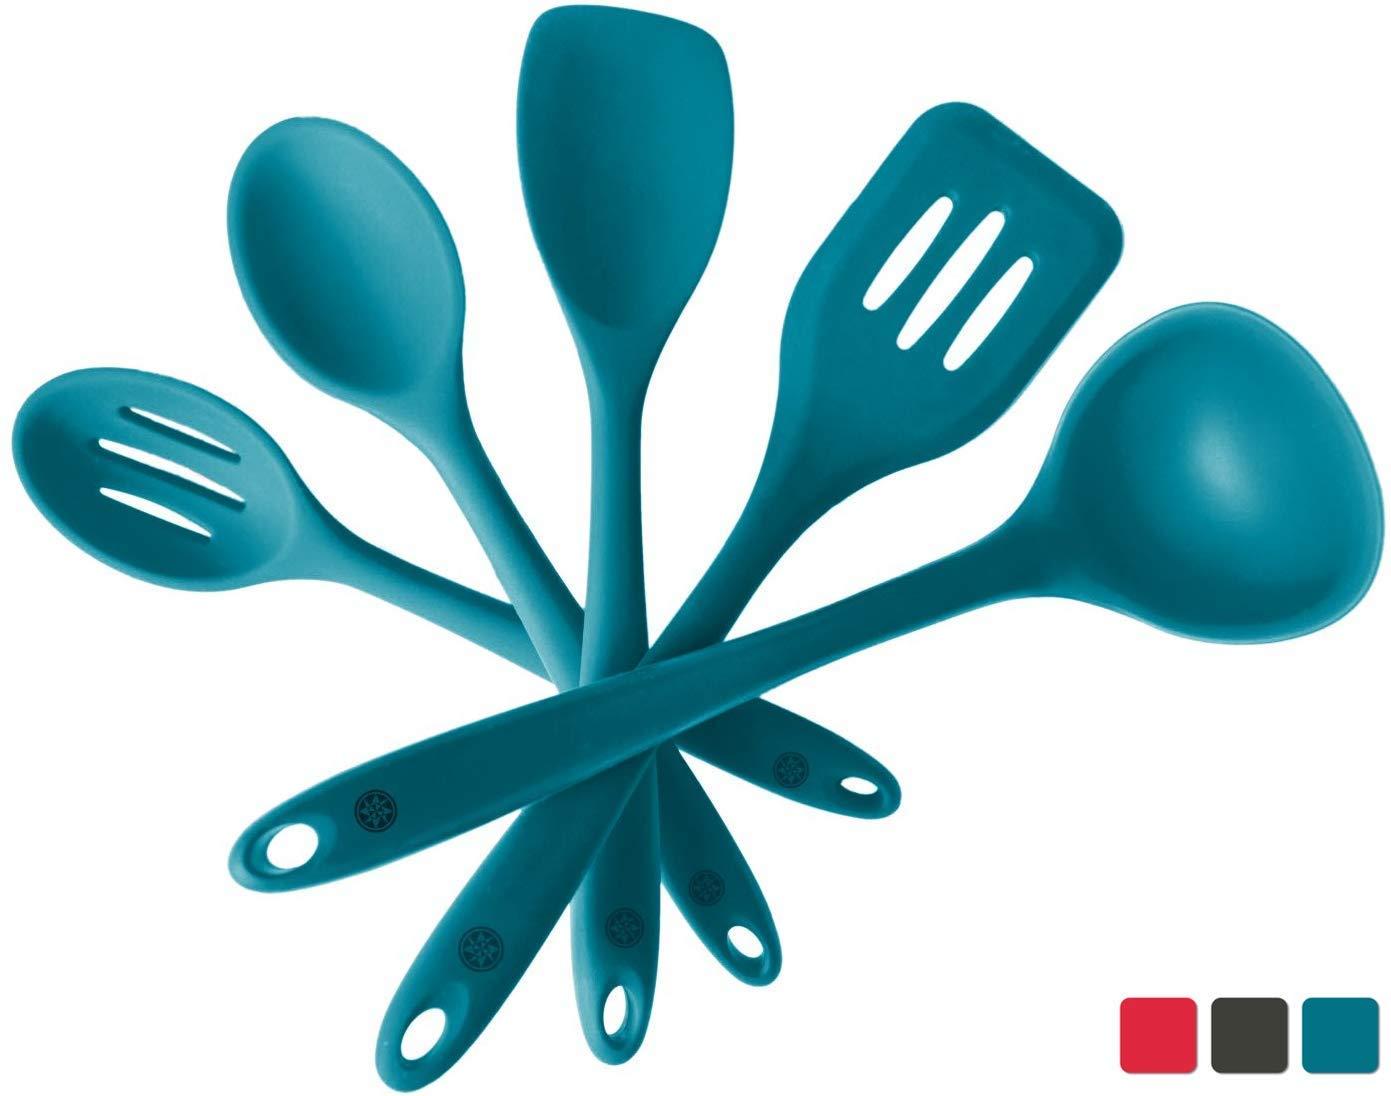 StarPack Home, Premium Silicone Kitchen Utensil Set (5 Pieces)